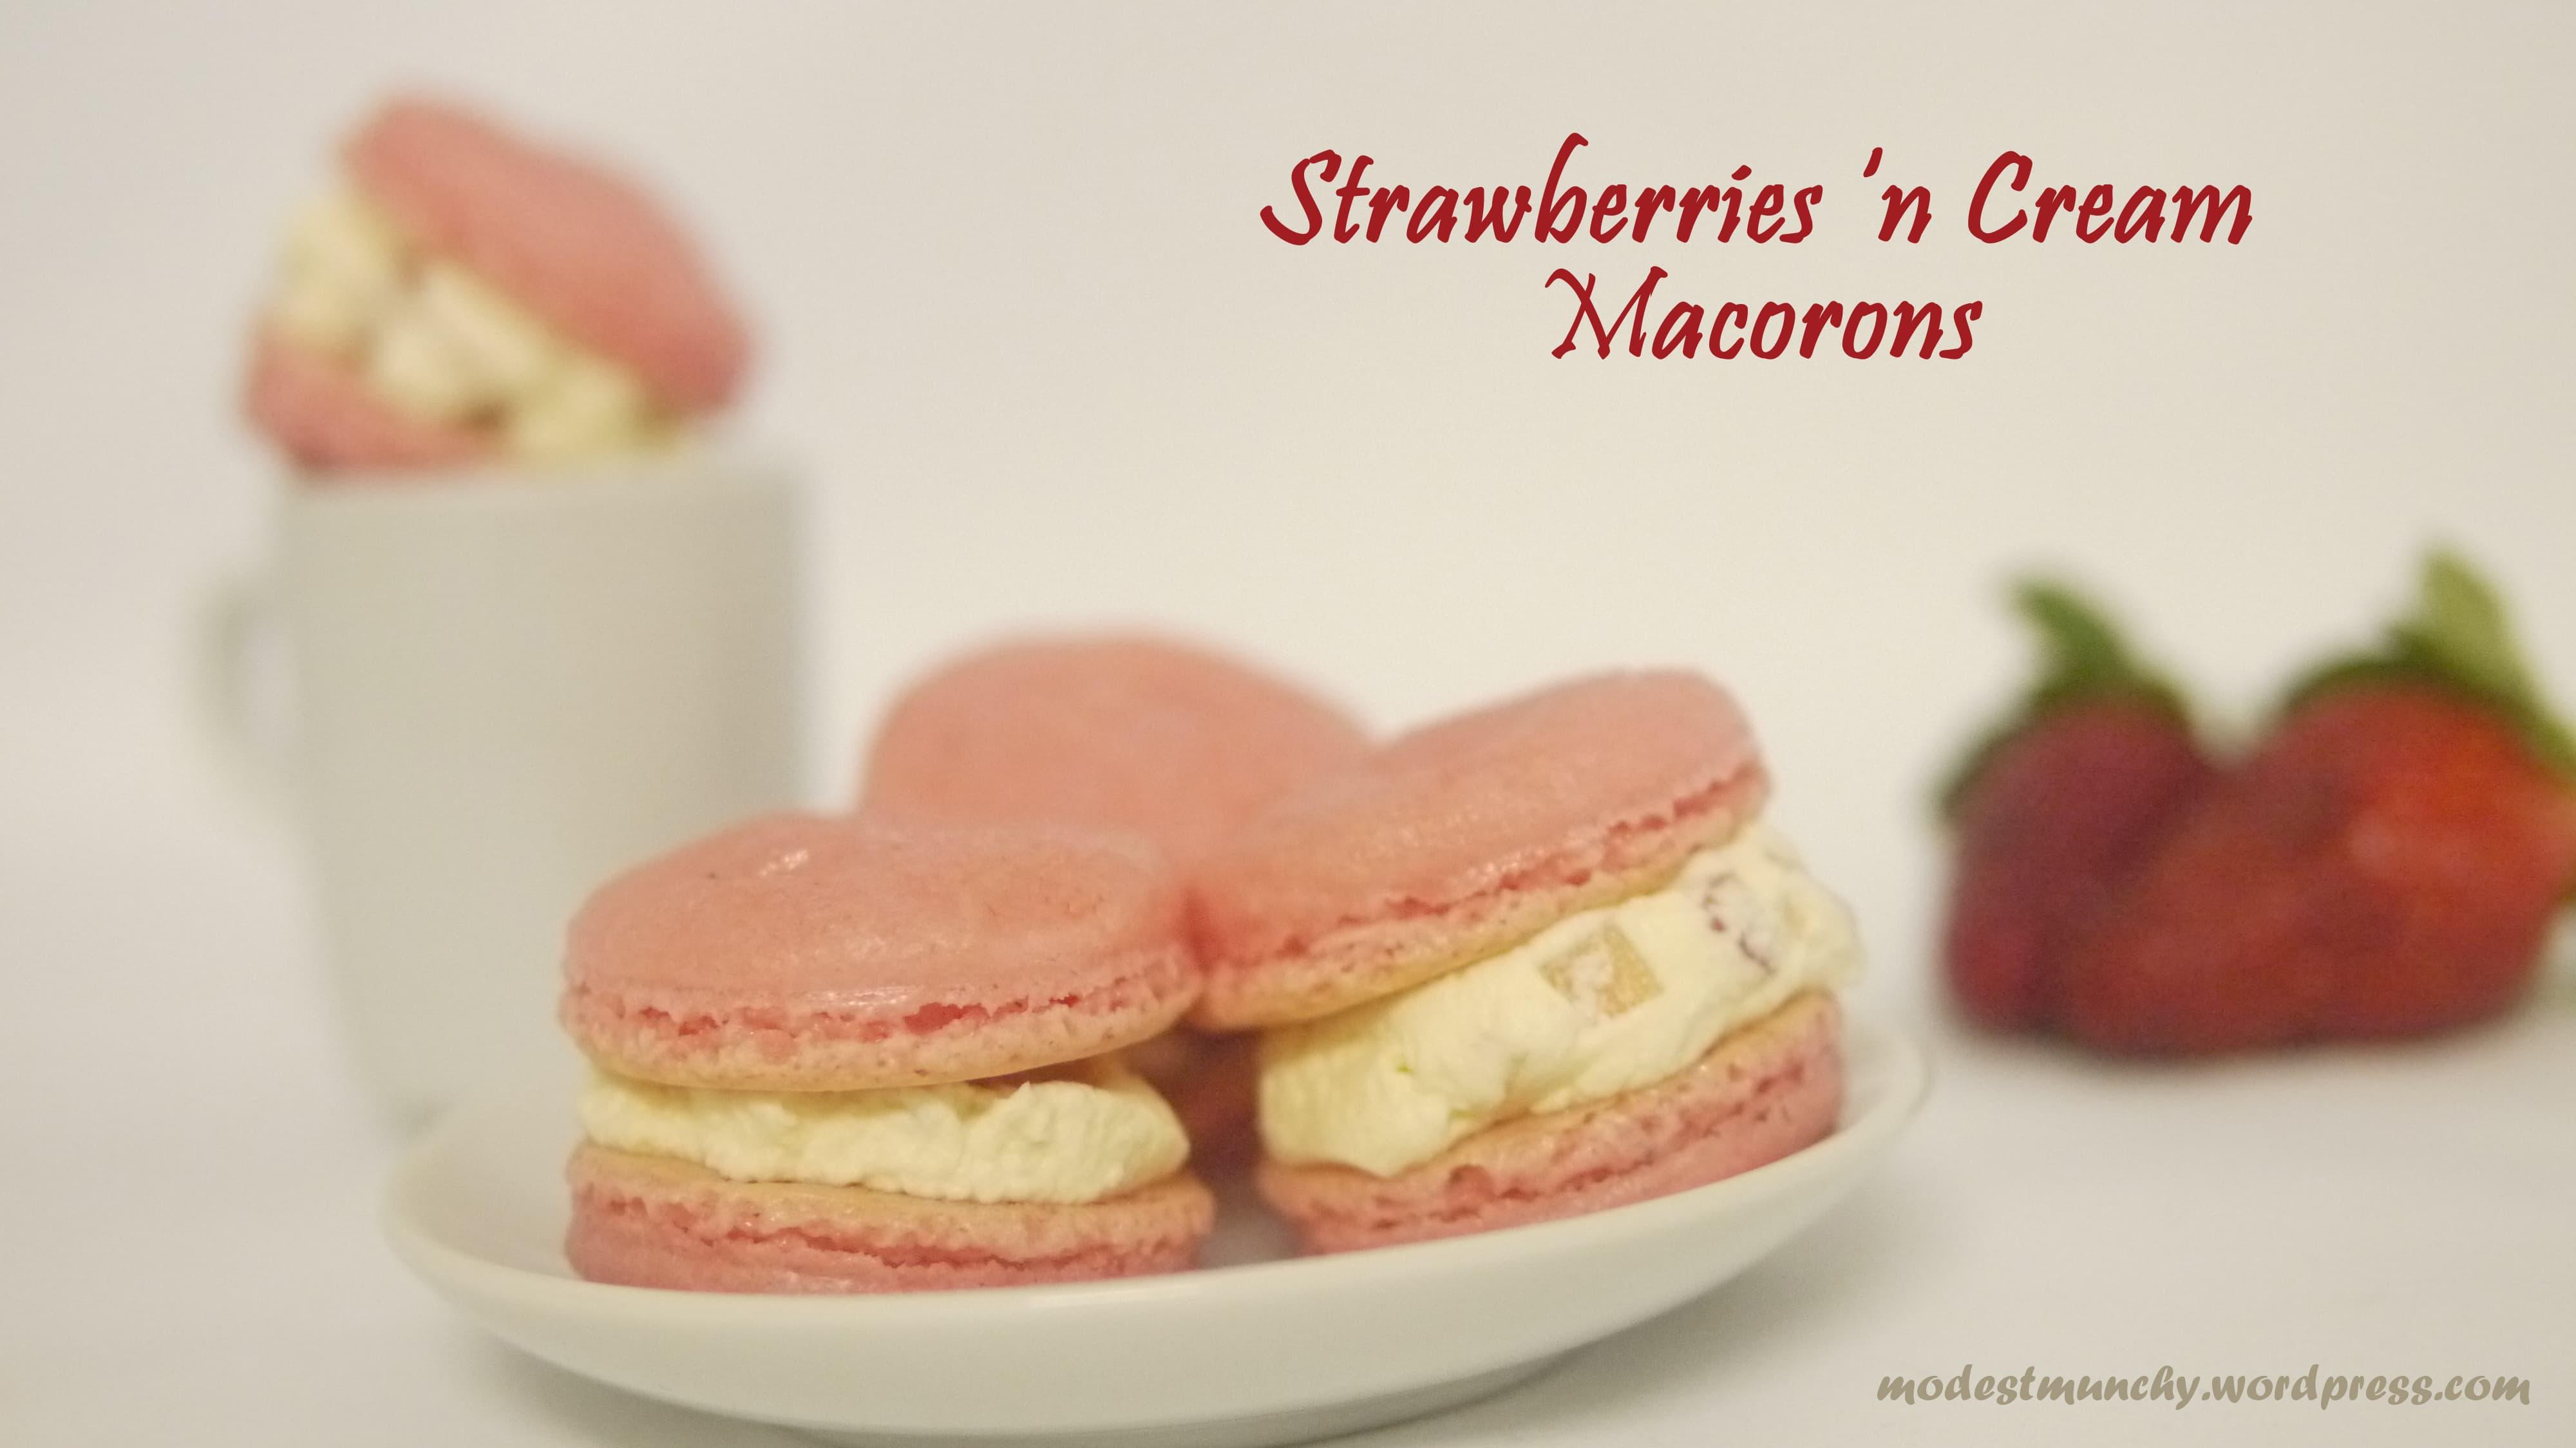 Strawberries 'n Cream Macarons